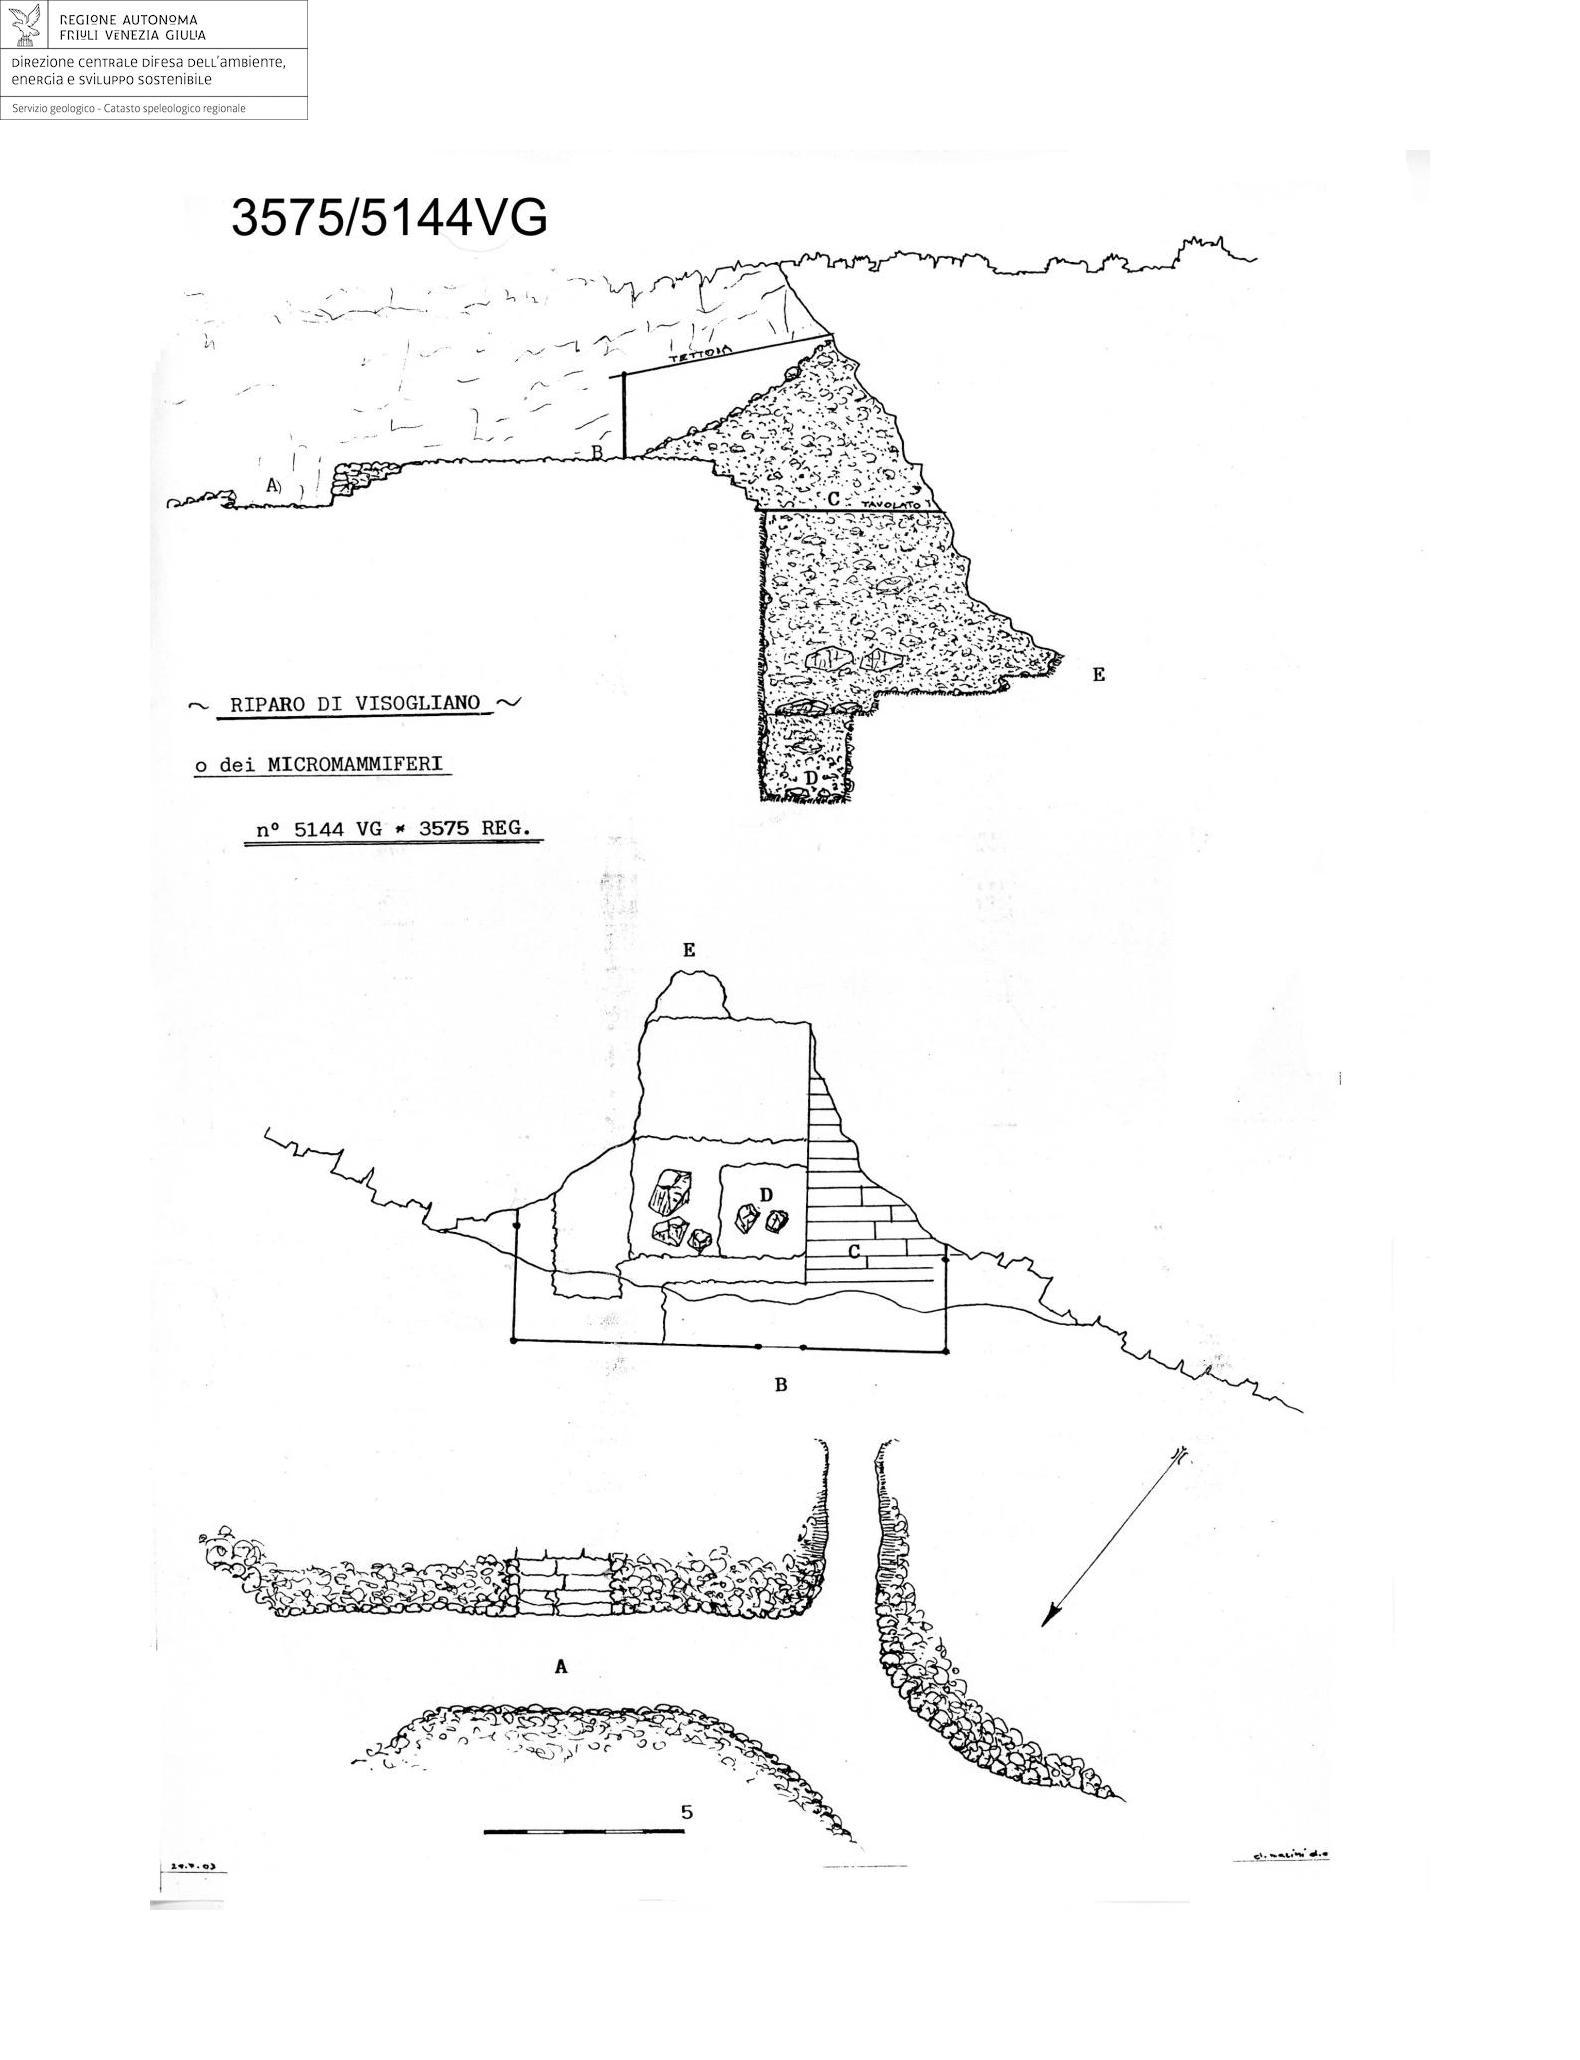 Riparo dei Micromammiferi